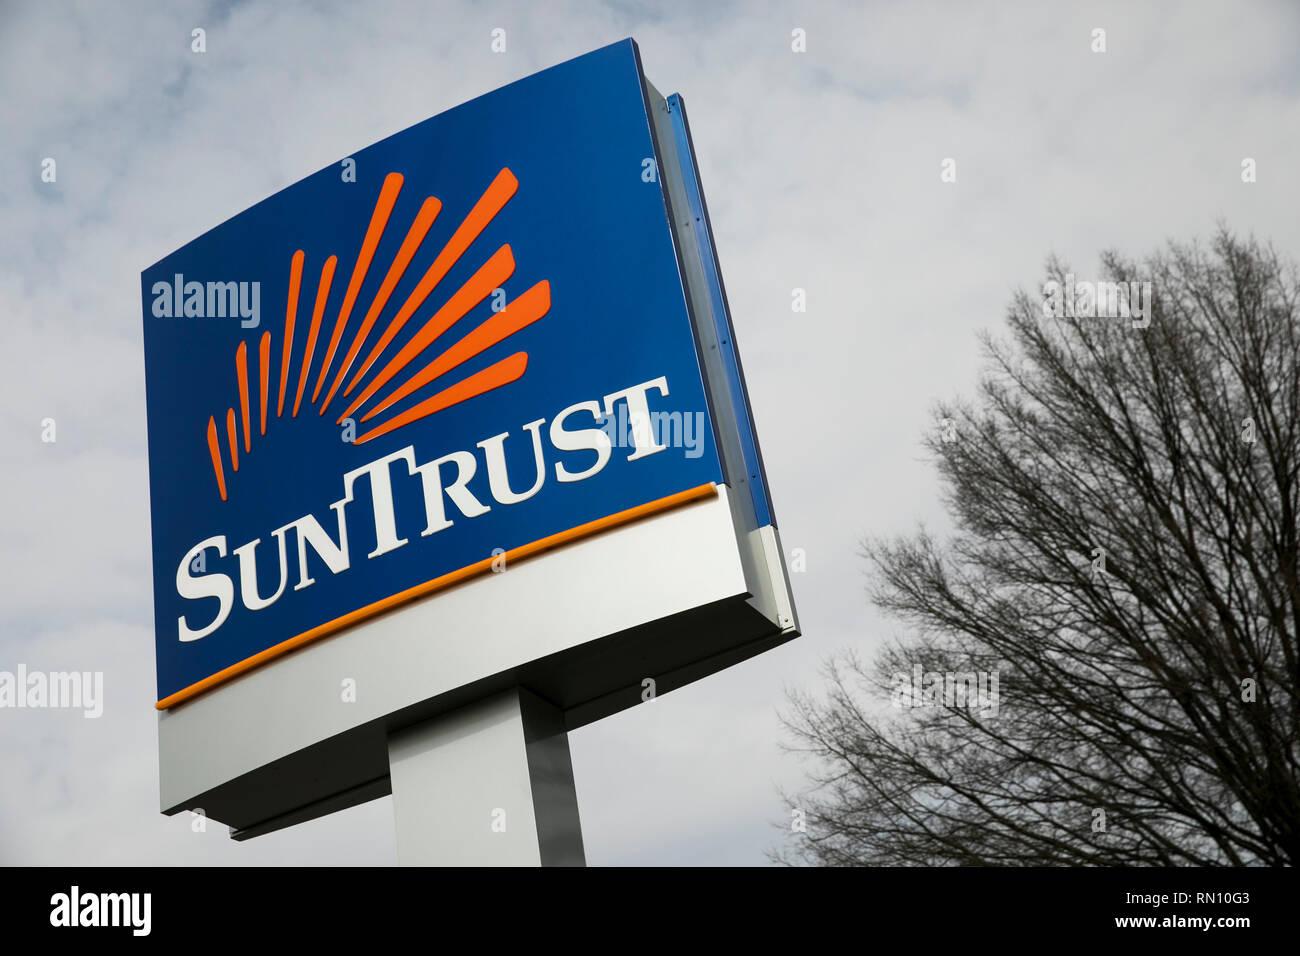 Suntrust Stock Photos & Suntrust Stock Images - Alamy